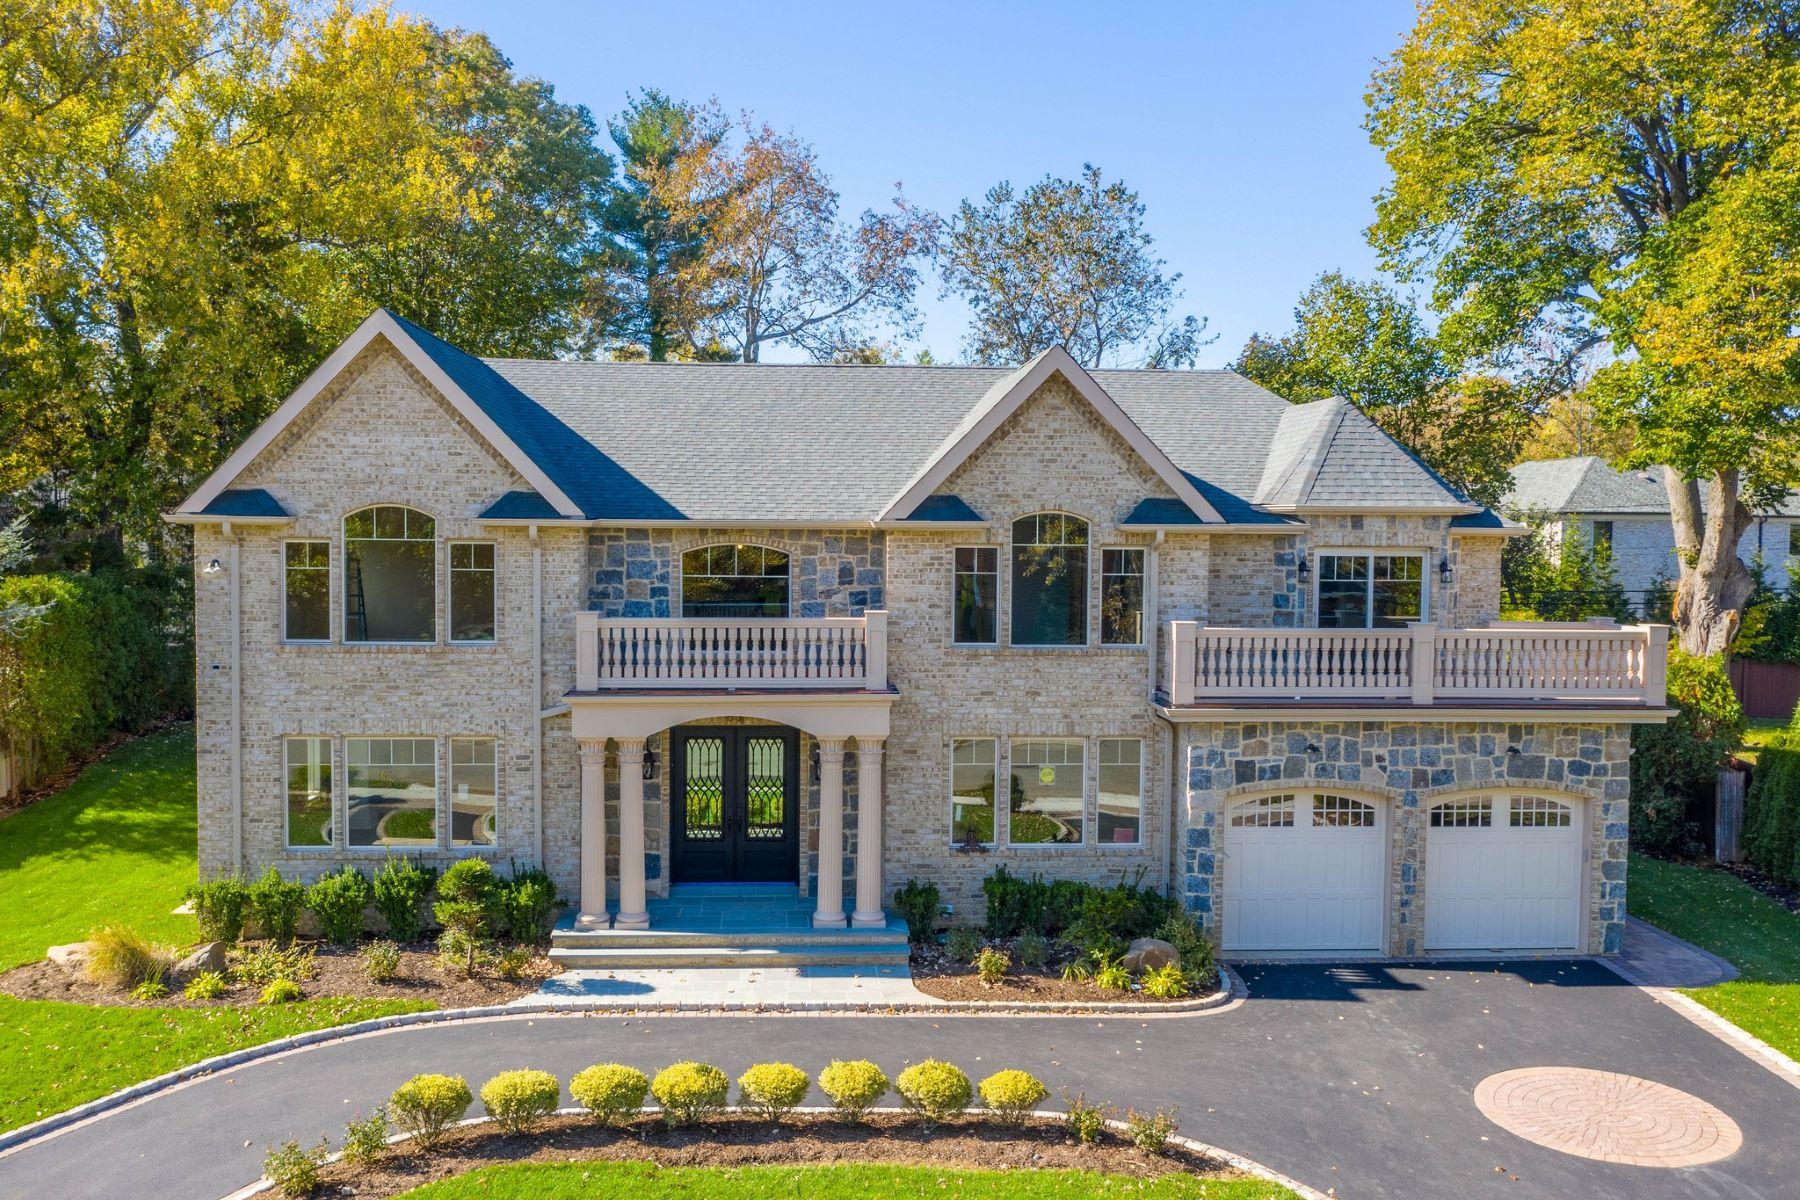 Single Family Homes für Verkauf beim Roslyn Heights 53 Barnyard Ln, Roslyn Heights, New York 11577 Vereinigte Staaten